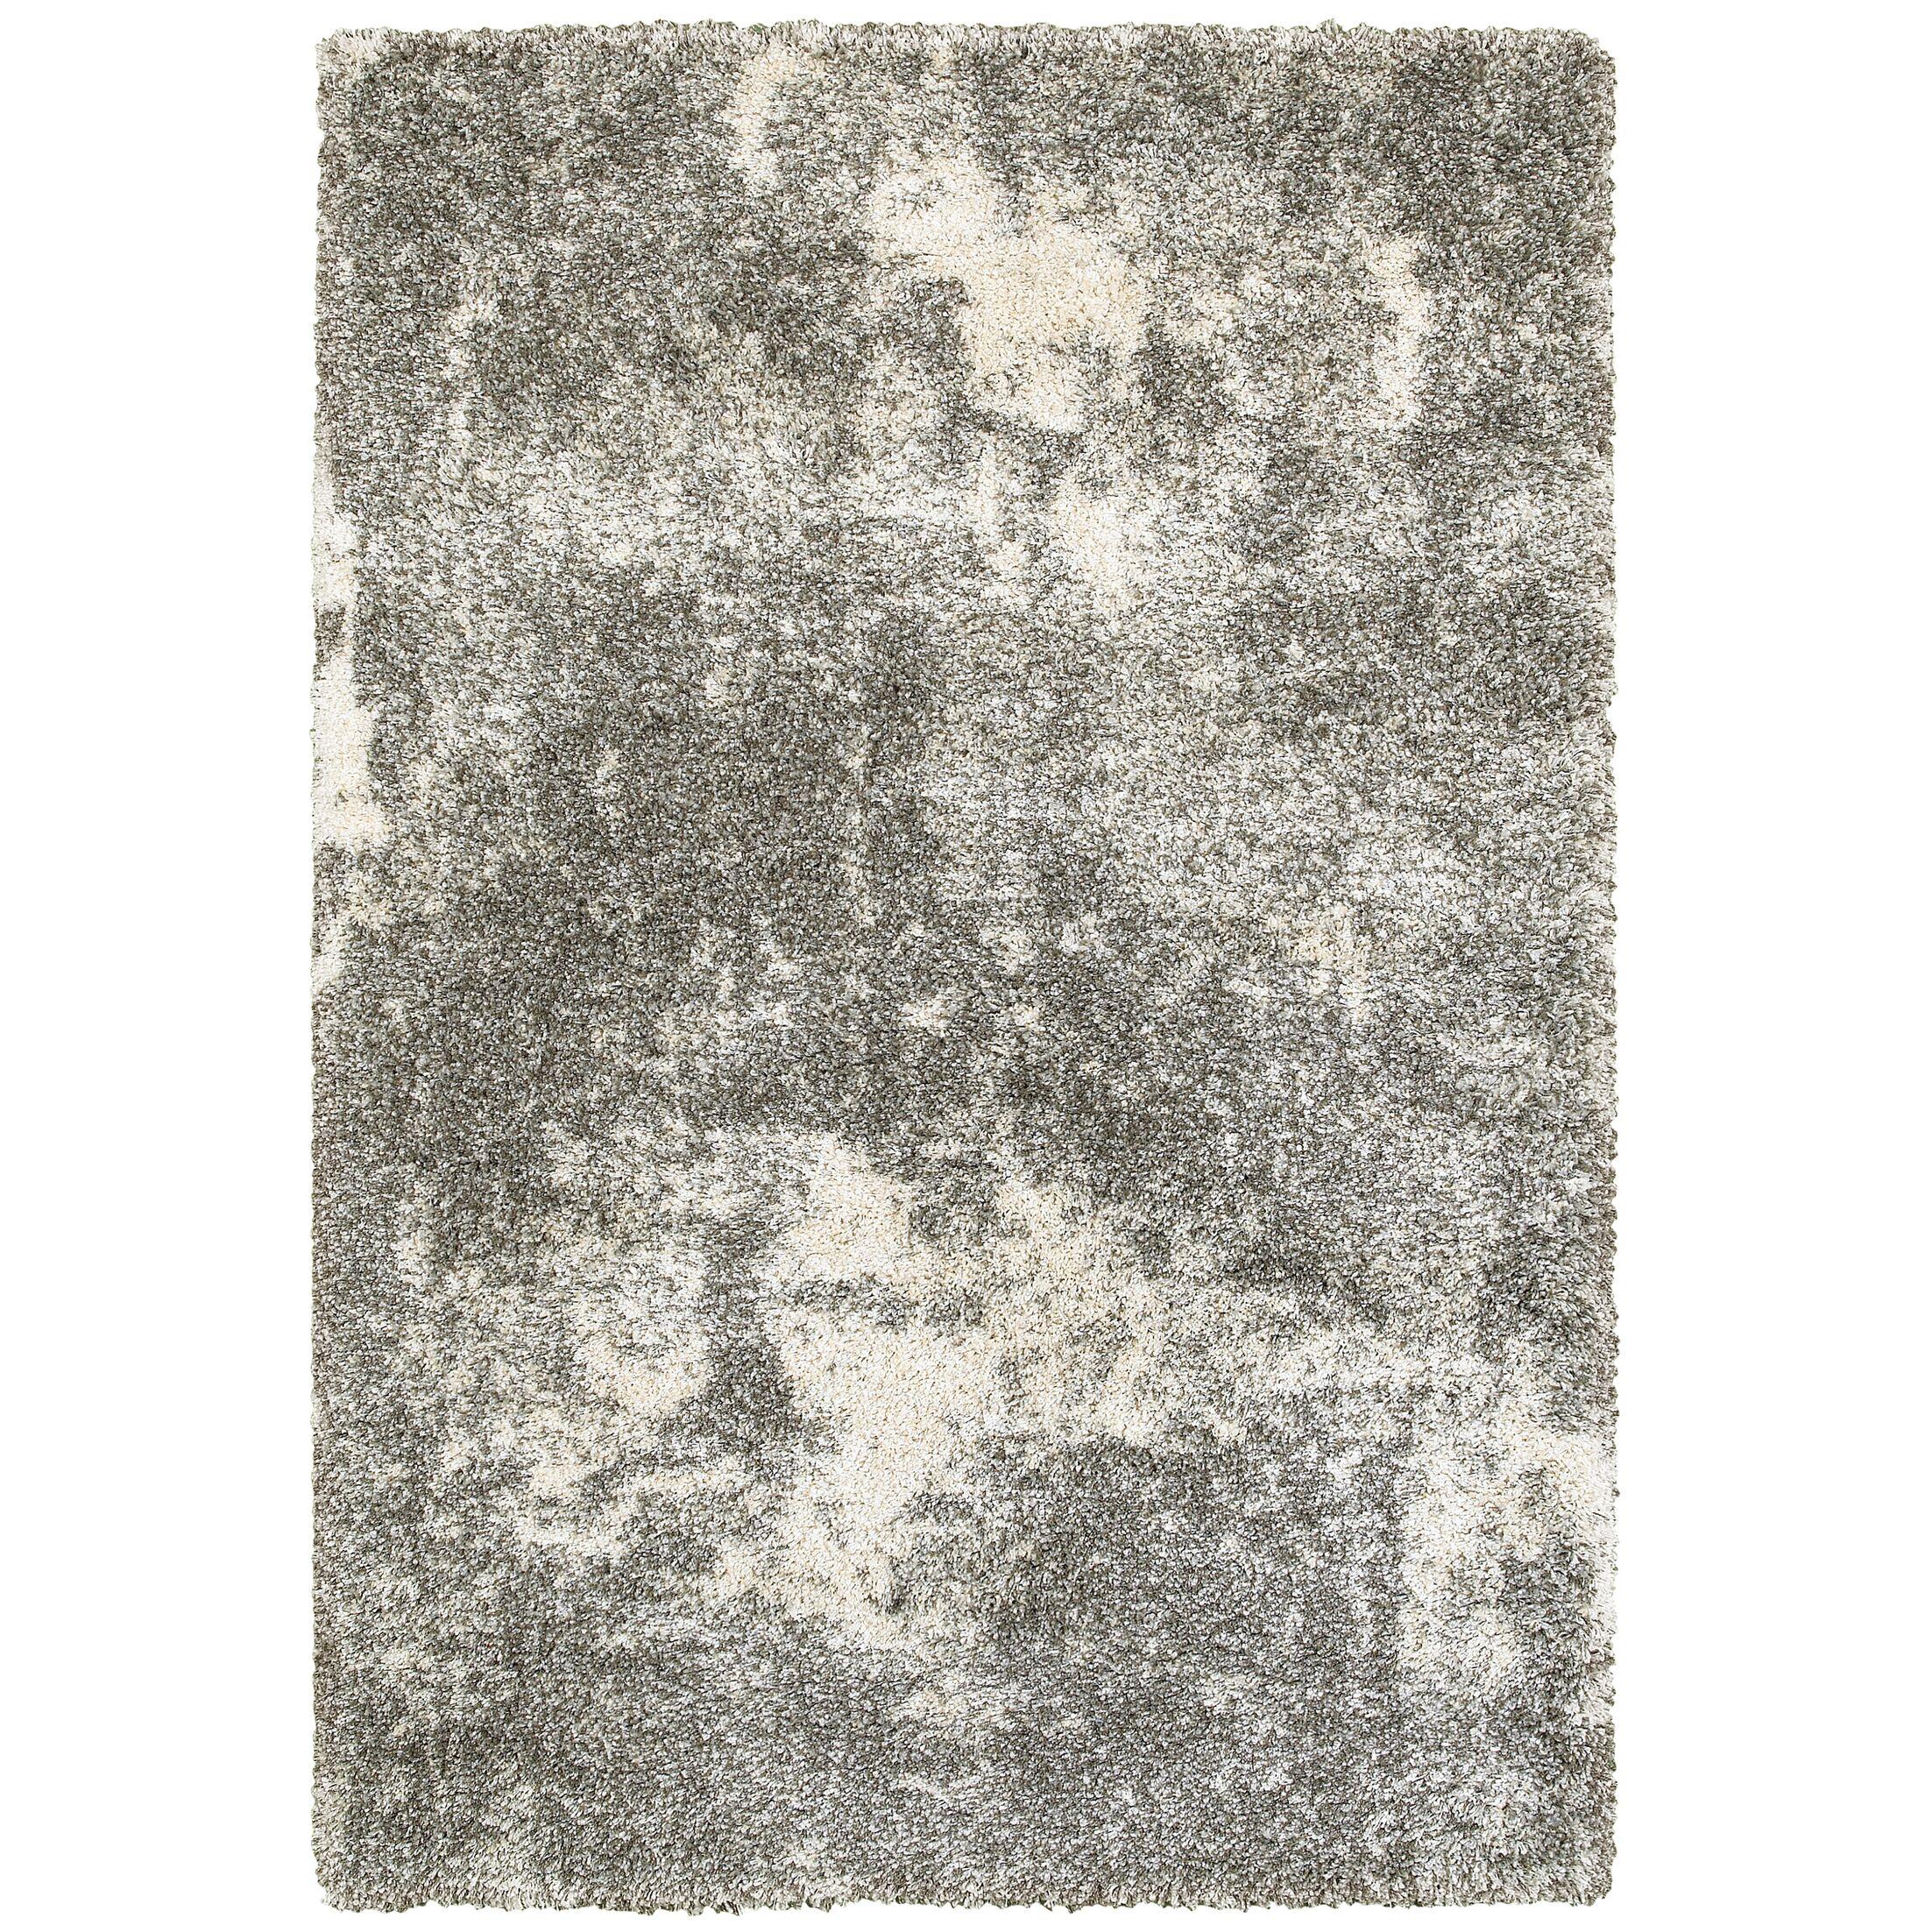 Leonard Gray/Ivory Area Rug Size: Rectangle 6'7